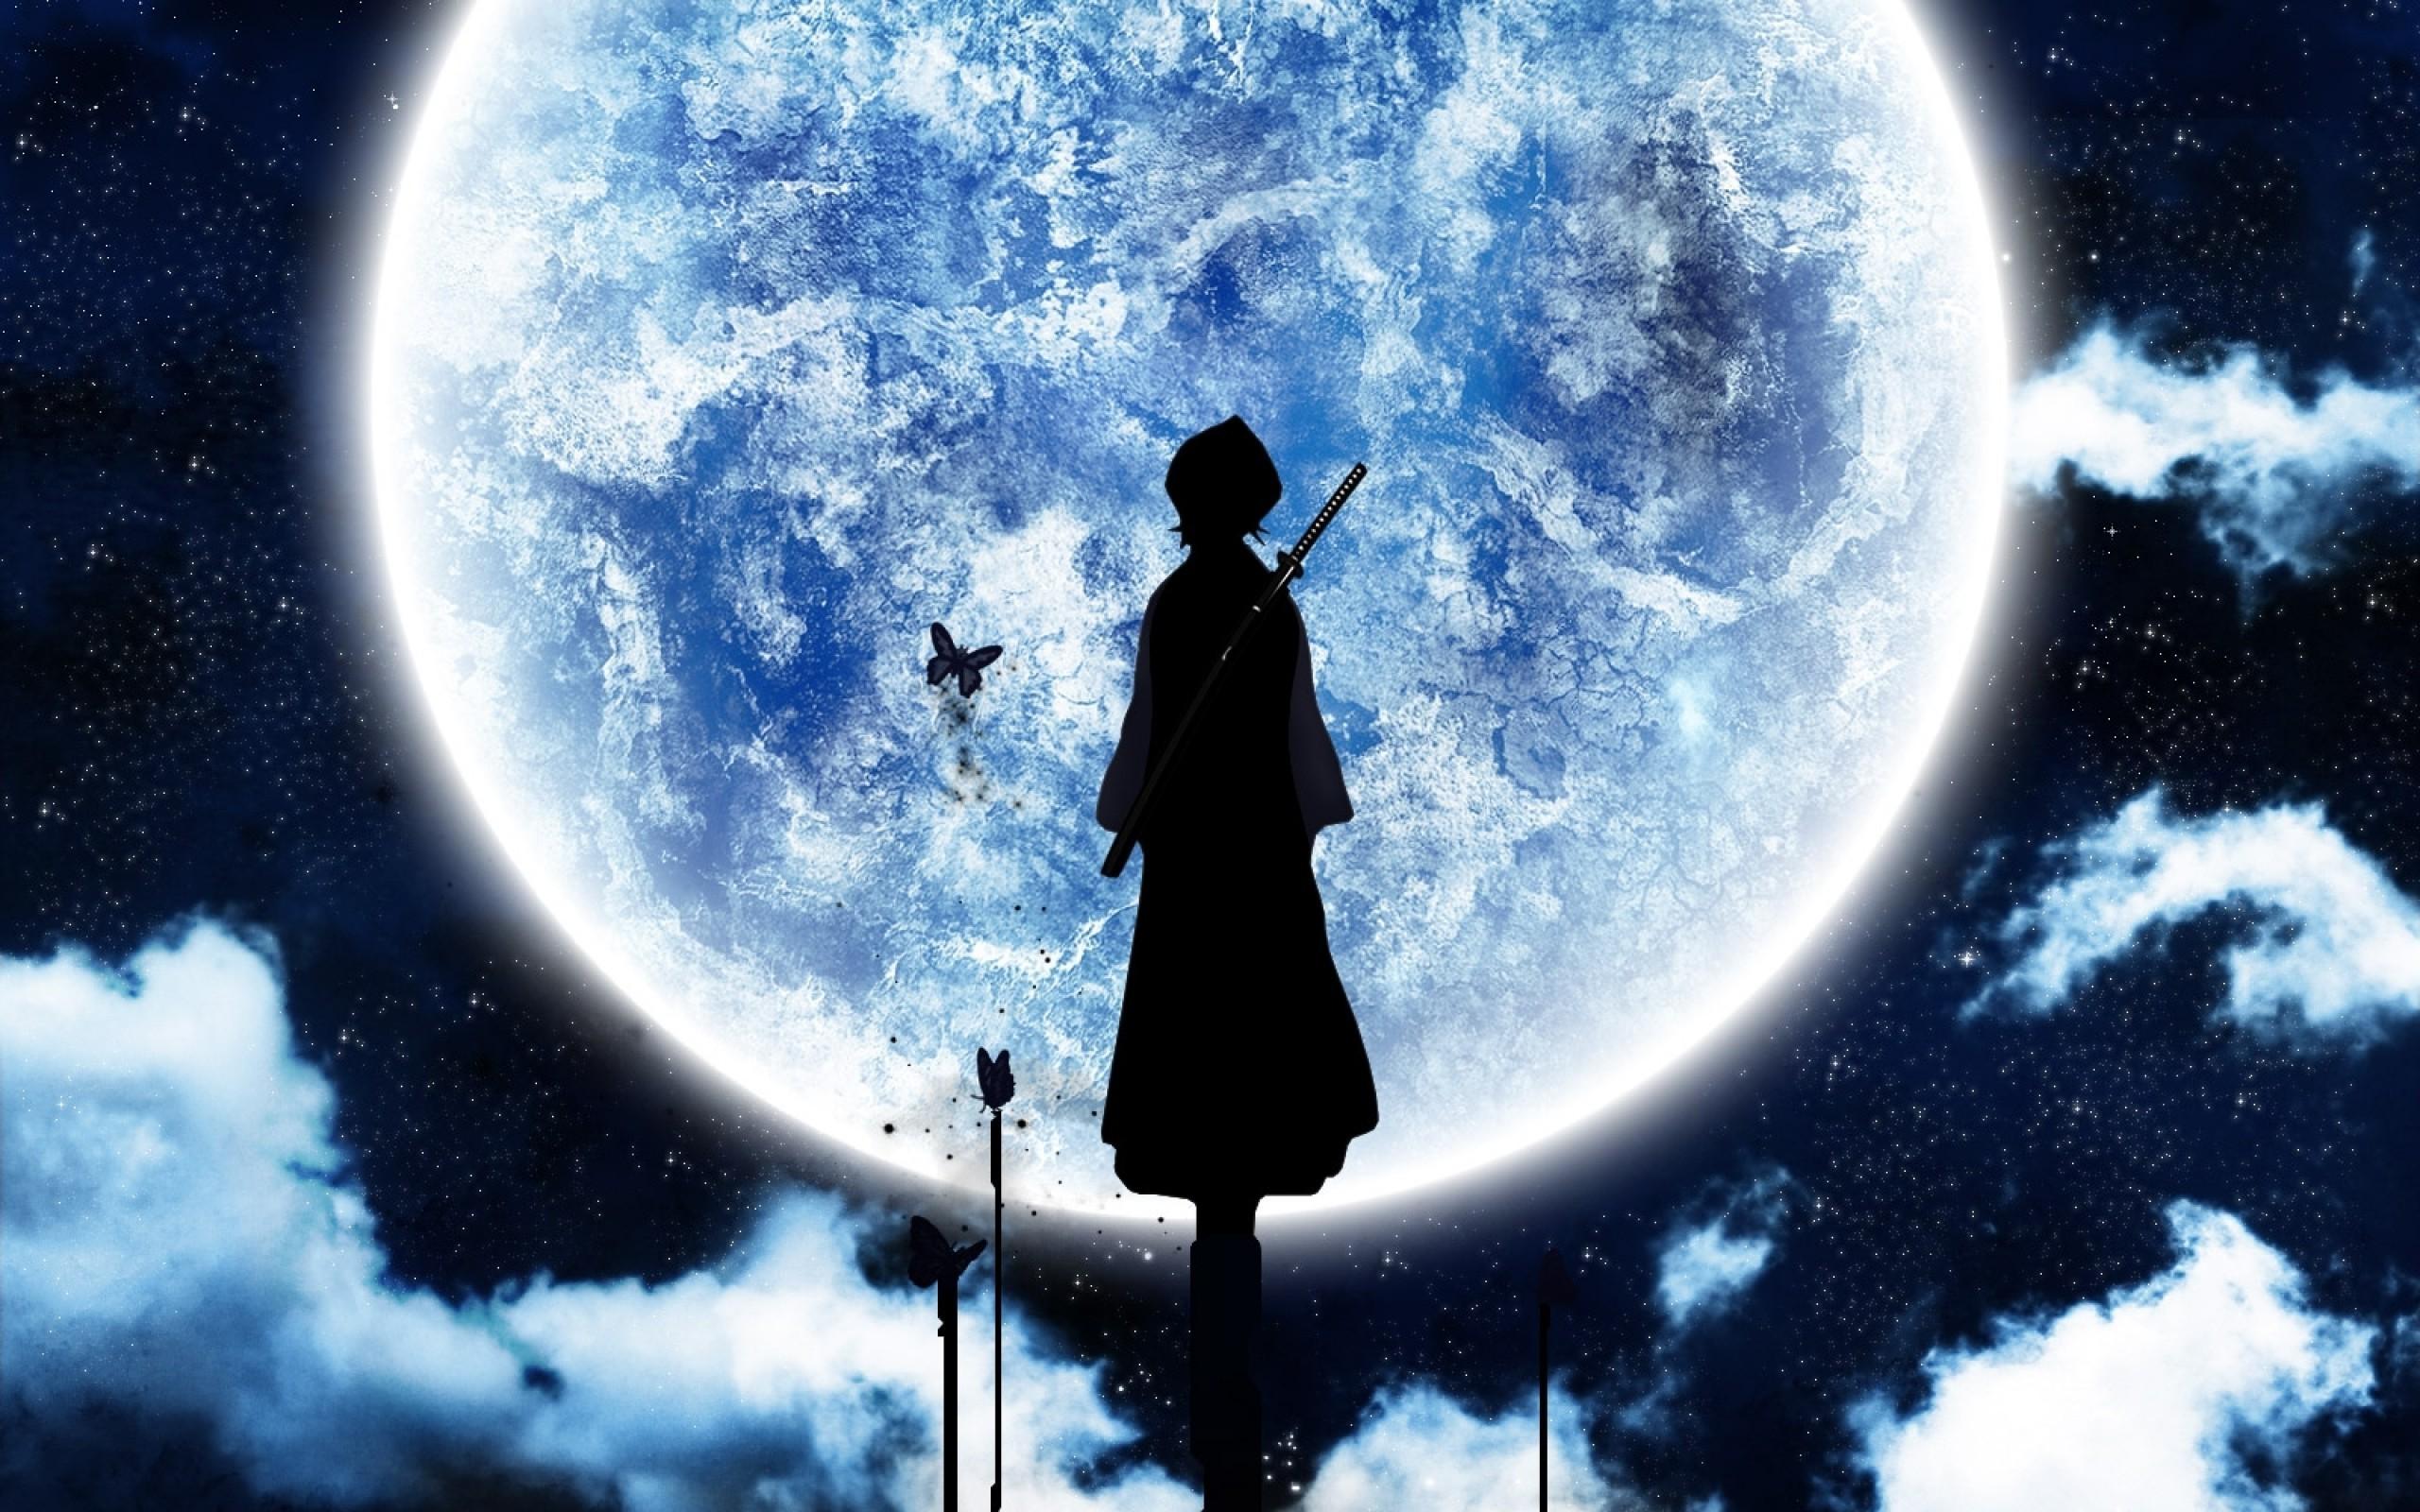 Anime Moon